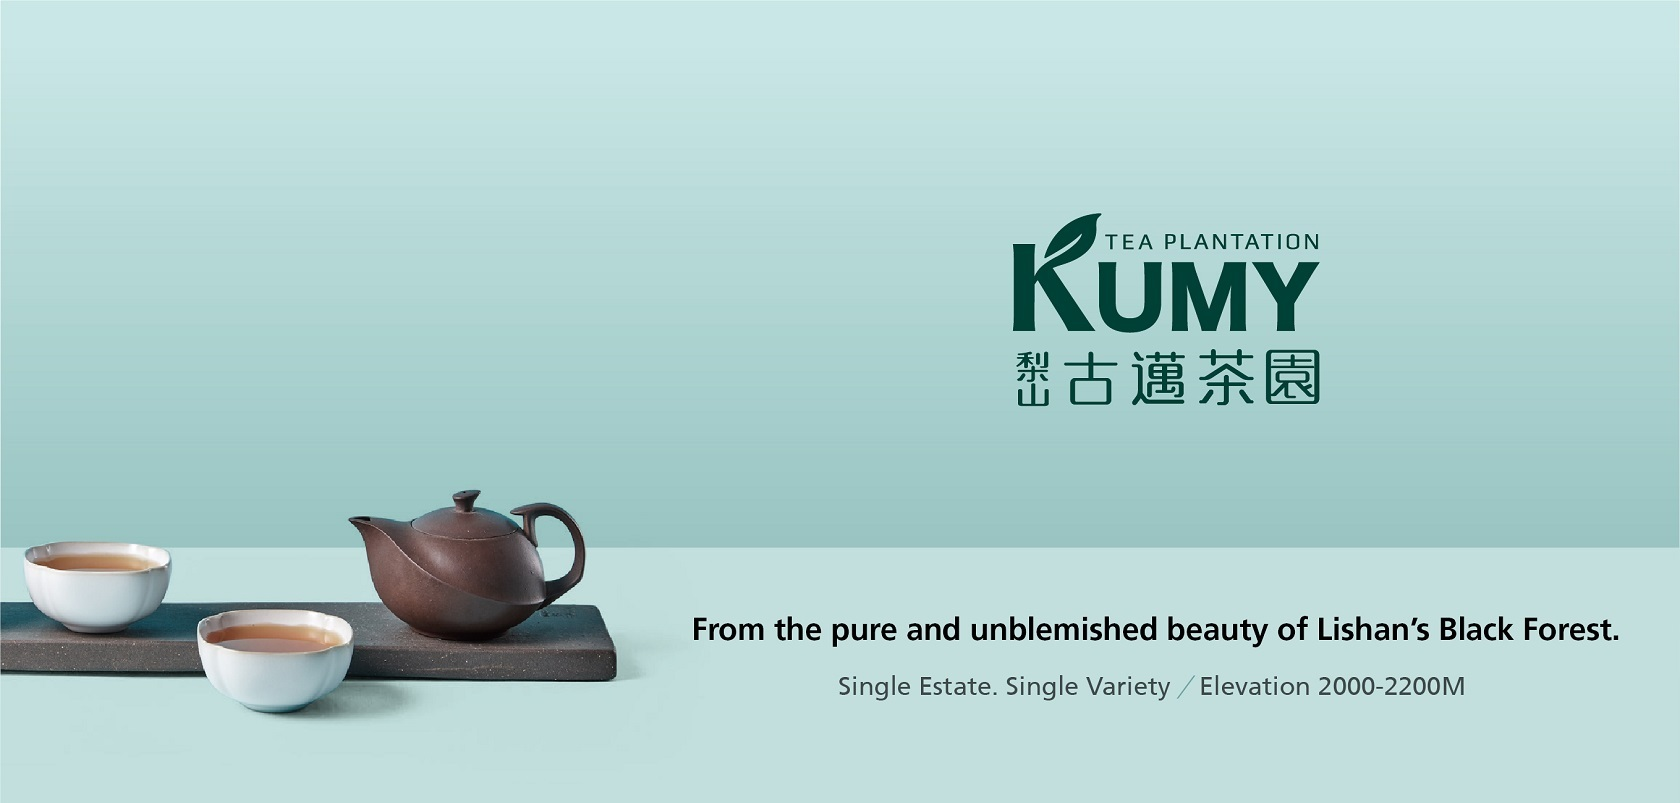 KUMY Tea Plantation